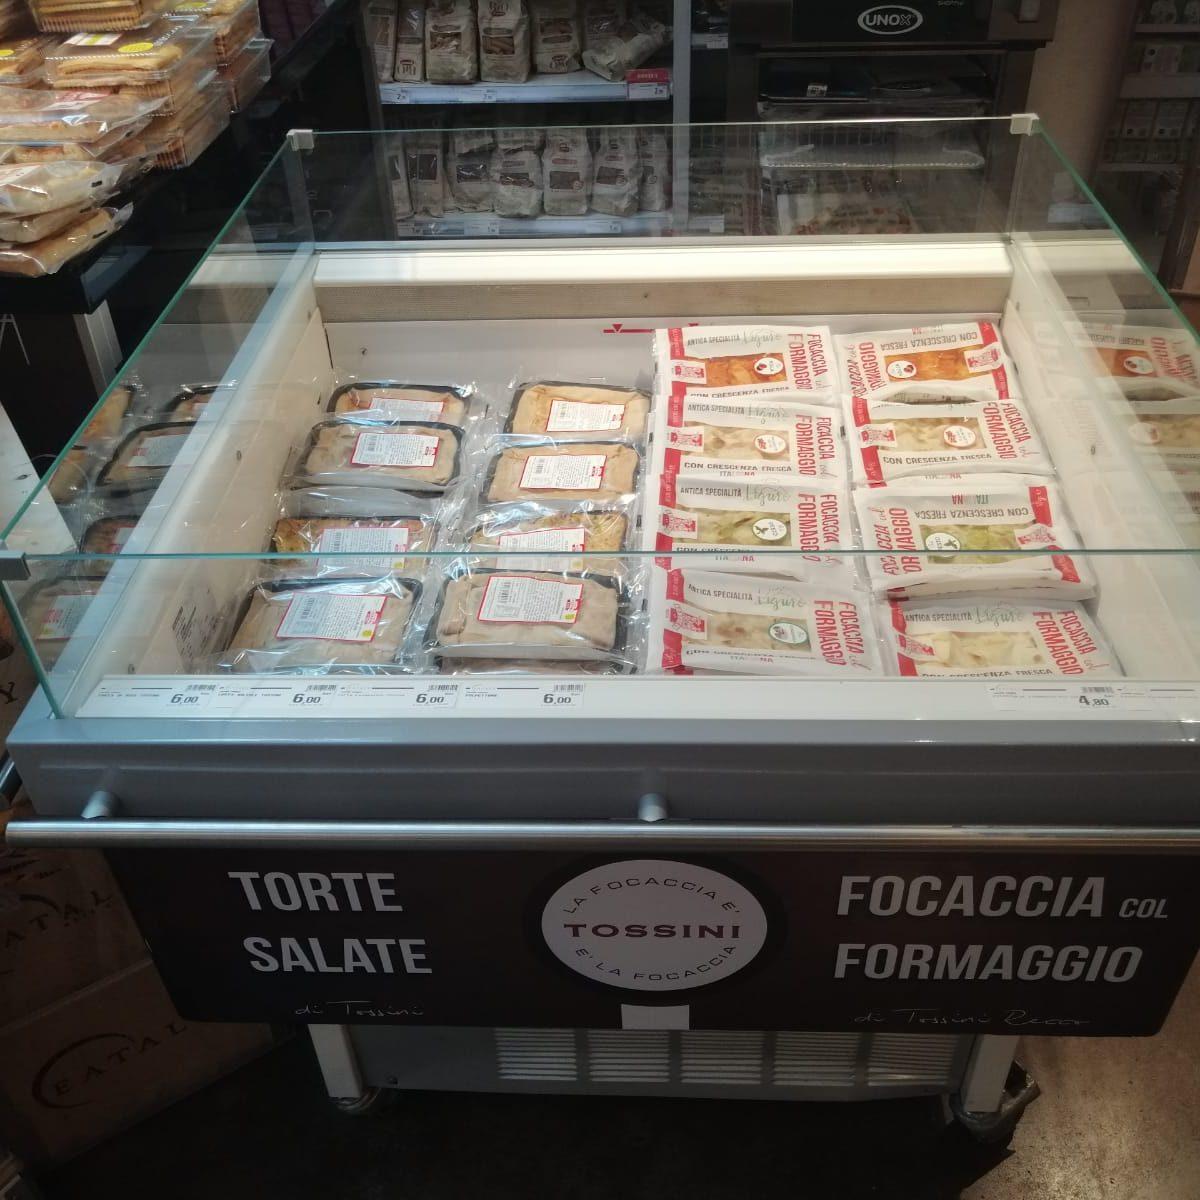 Corner Tossini -Eataly Store Milano Smeraldo (16)